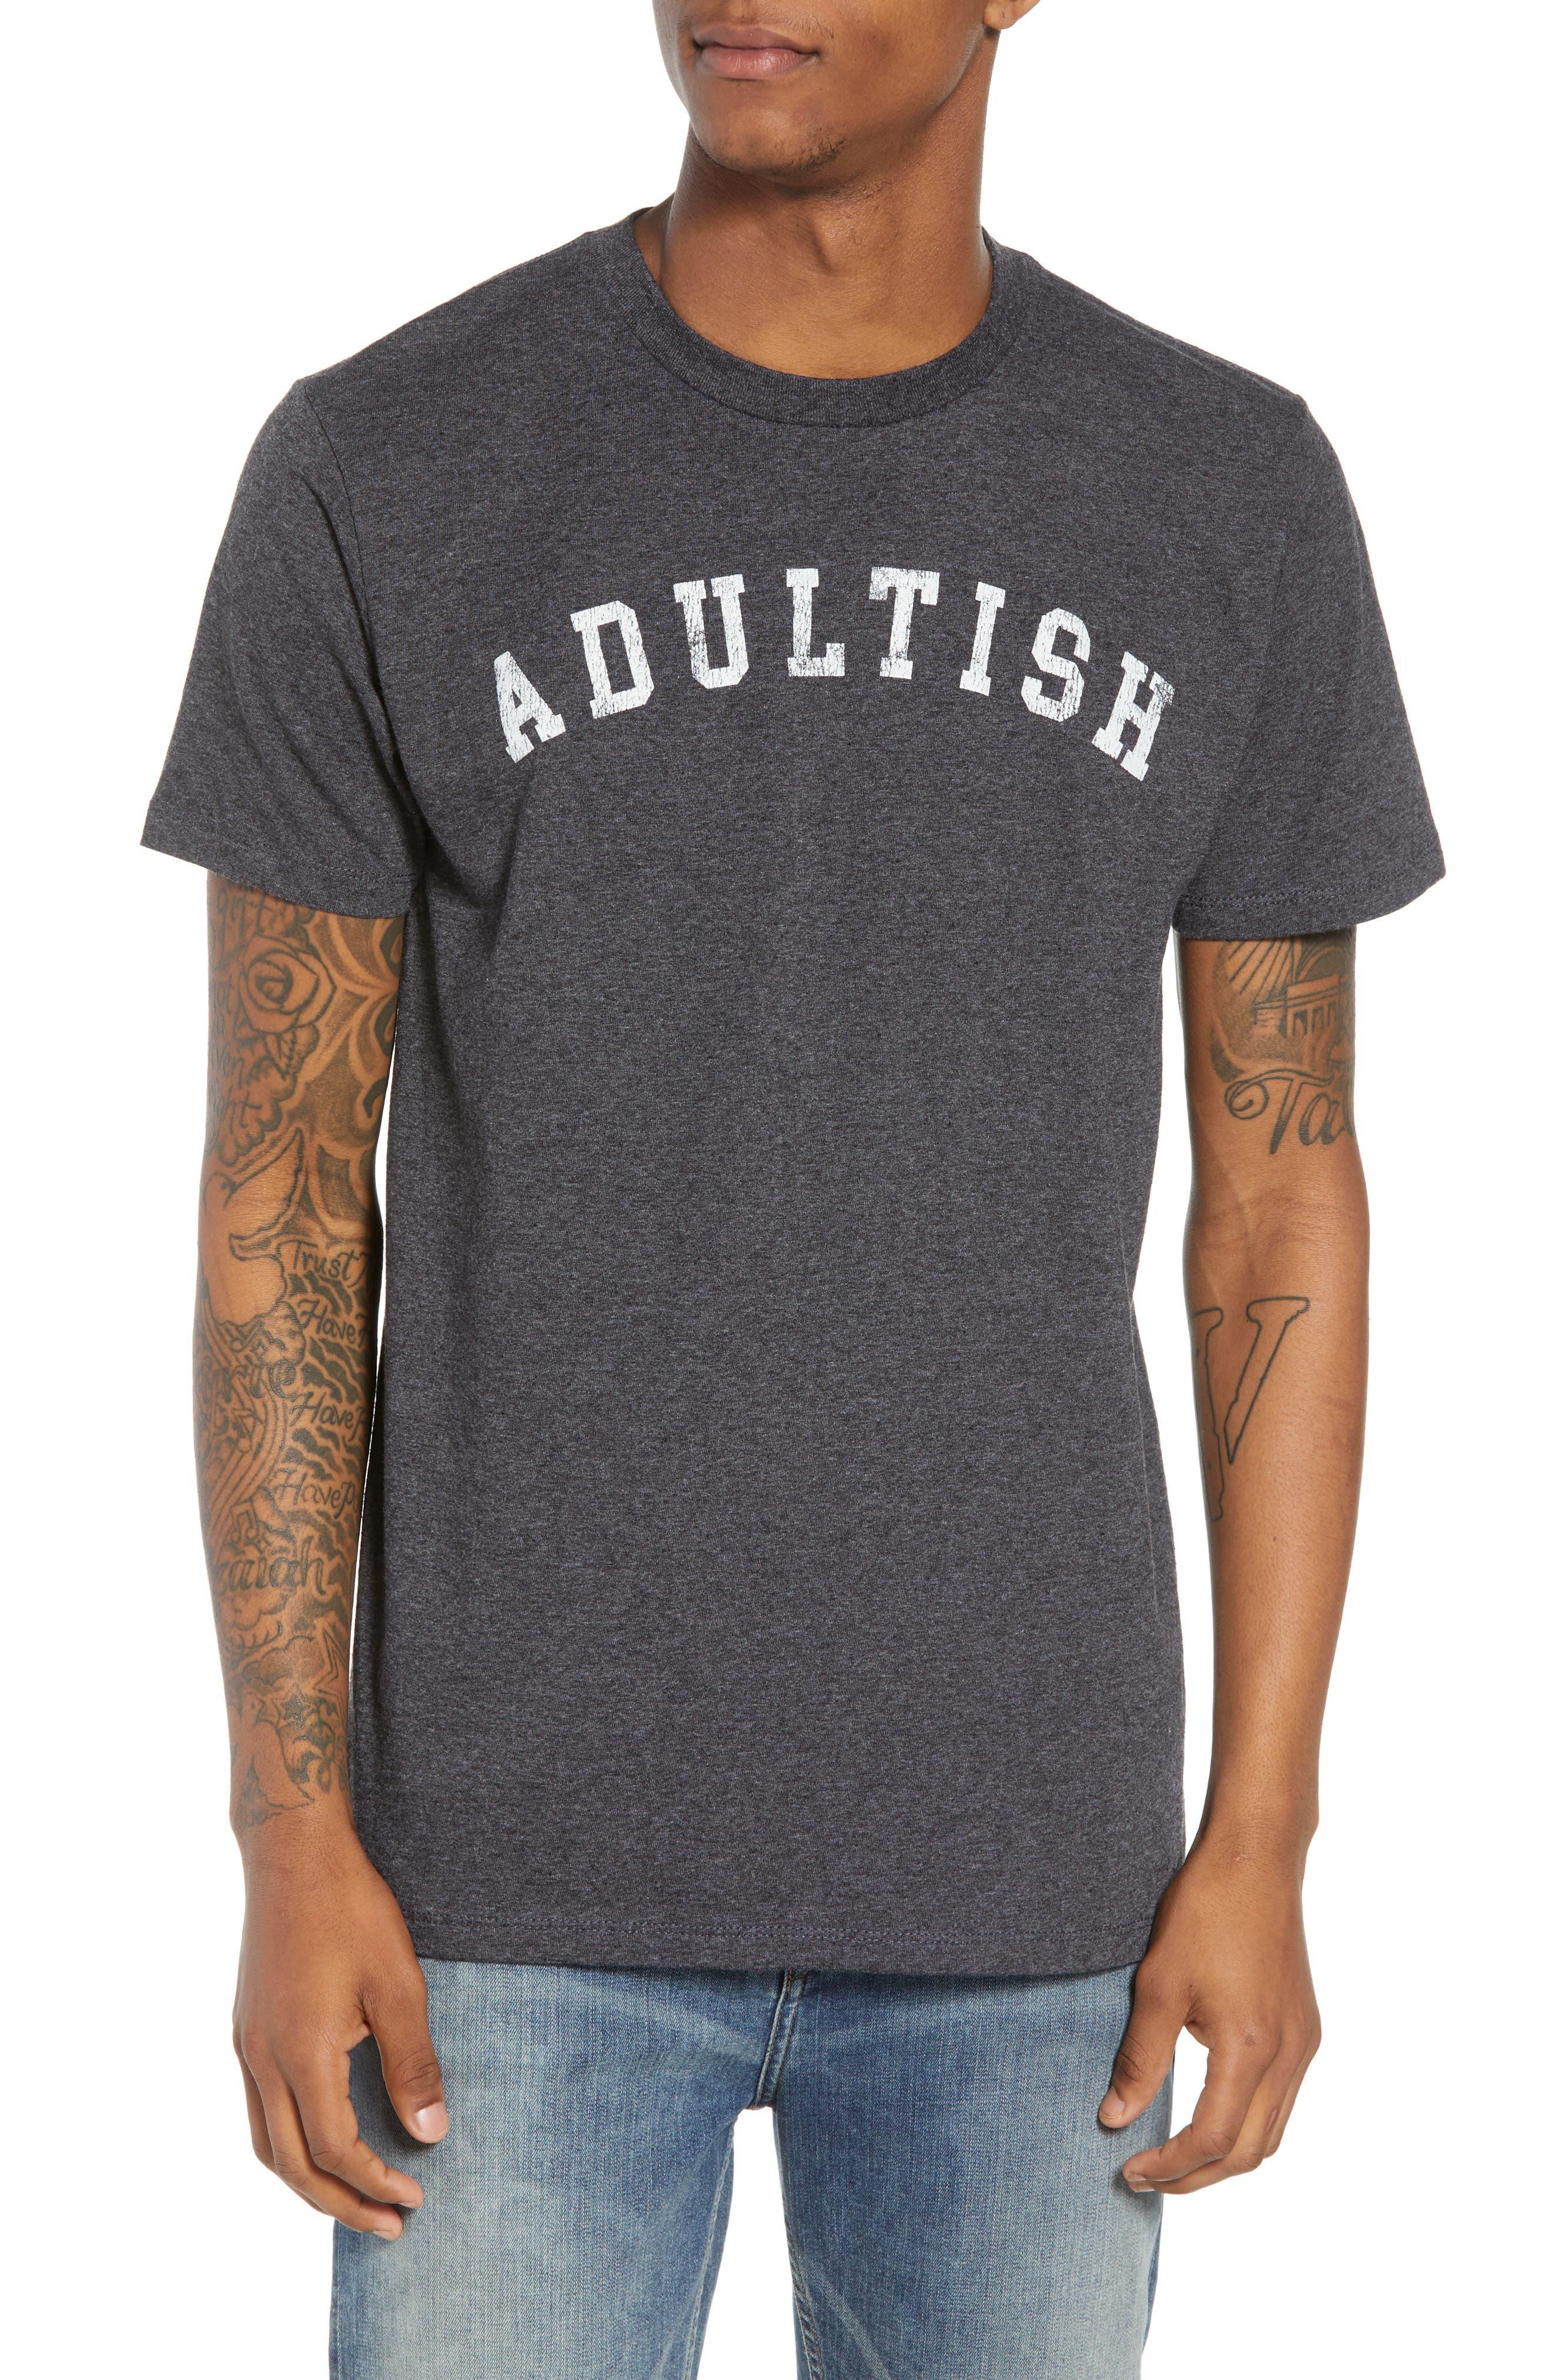 Adultish T-Shirt,                             Main thumbnail 1, color,                             001